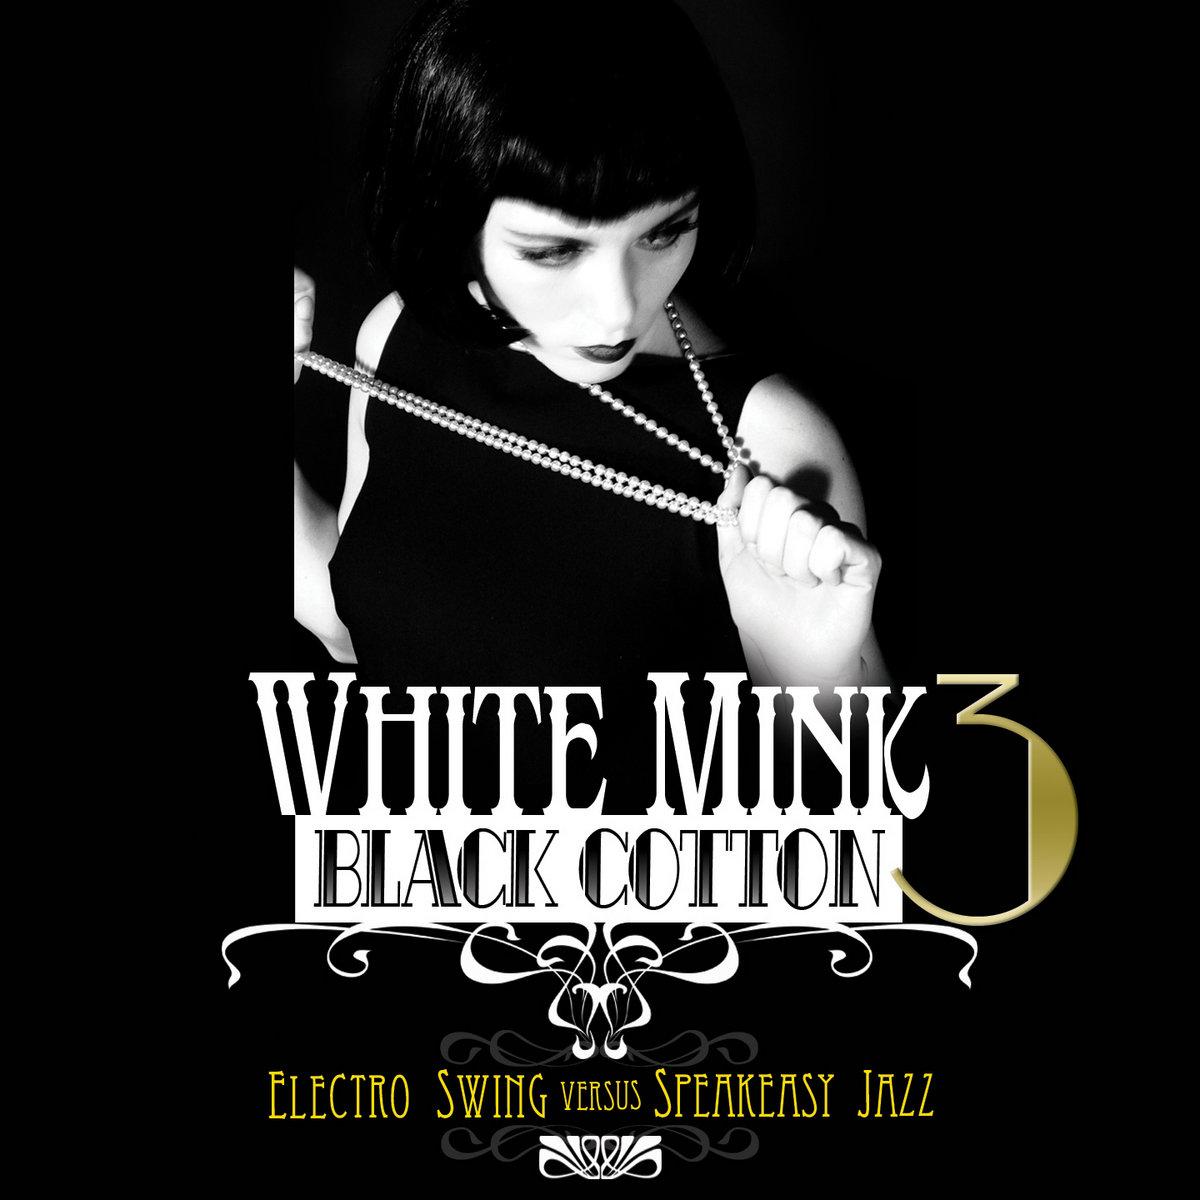 White Mink Black Cotton Vol 3 Electro Swing Versus